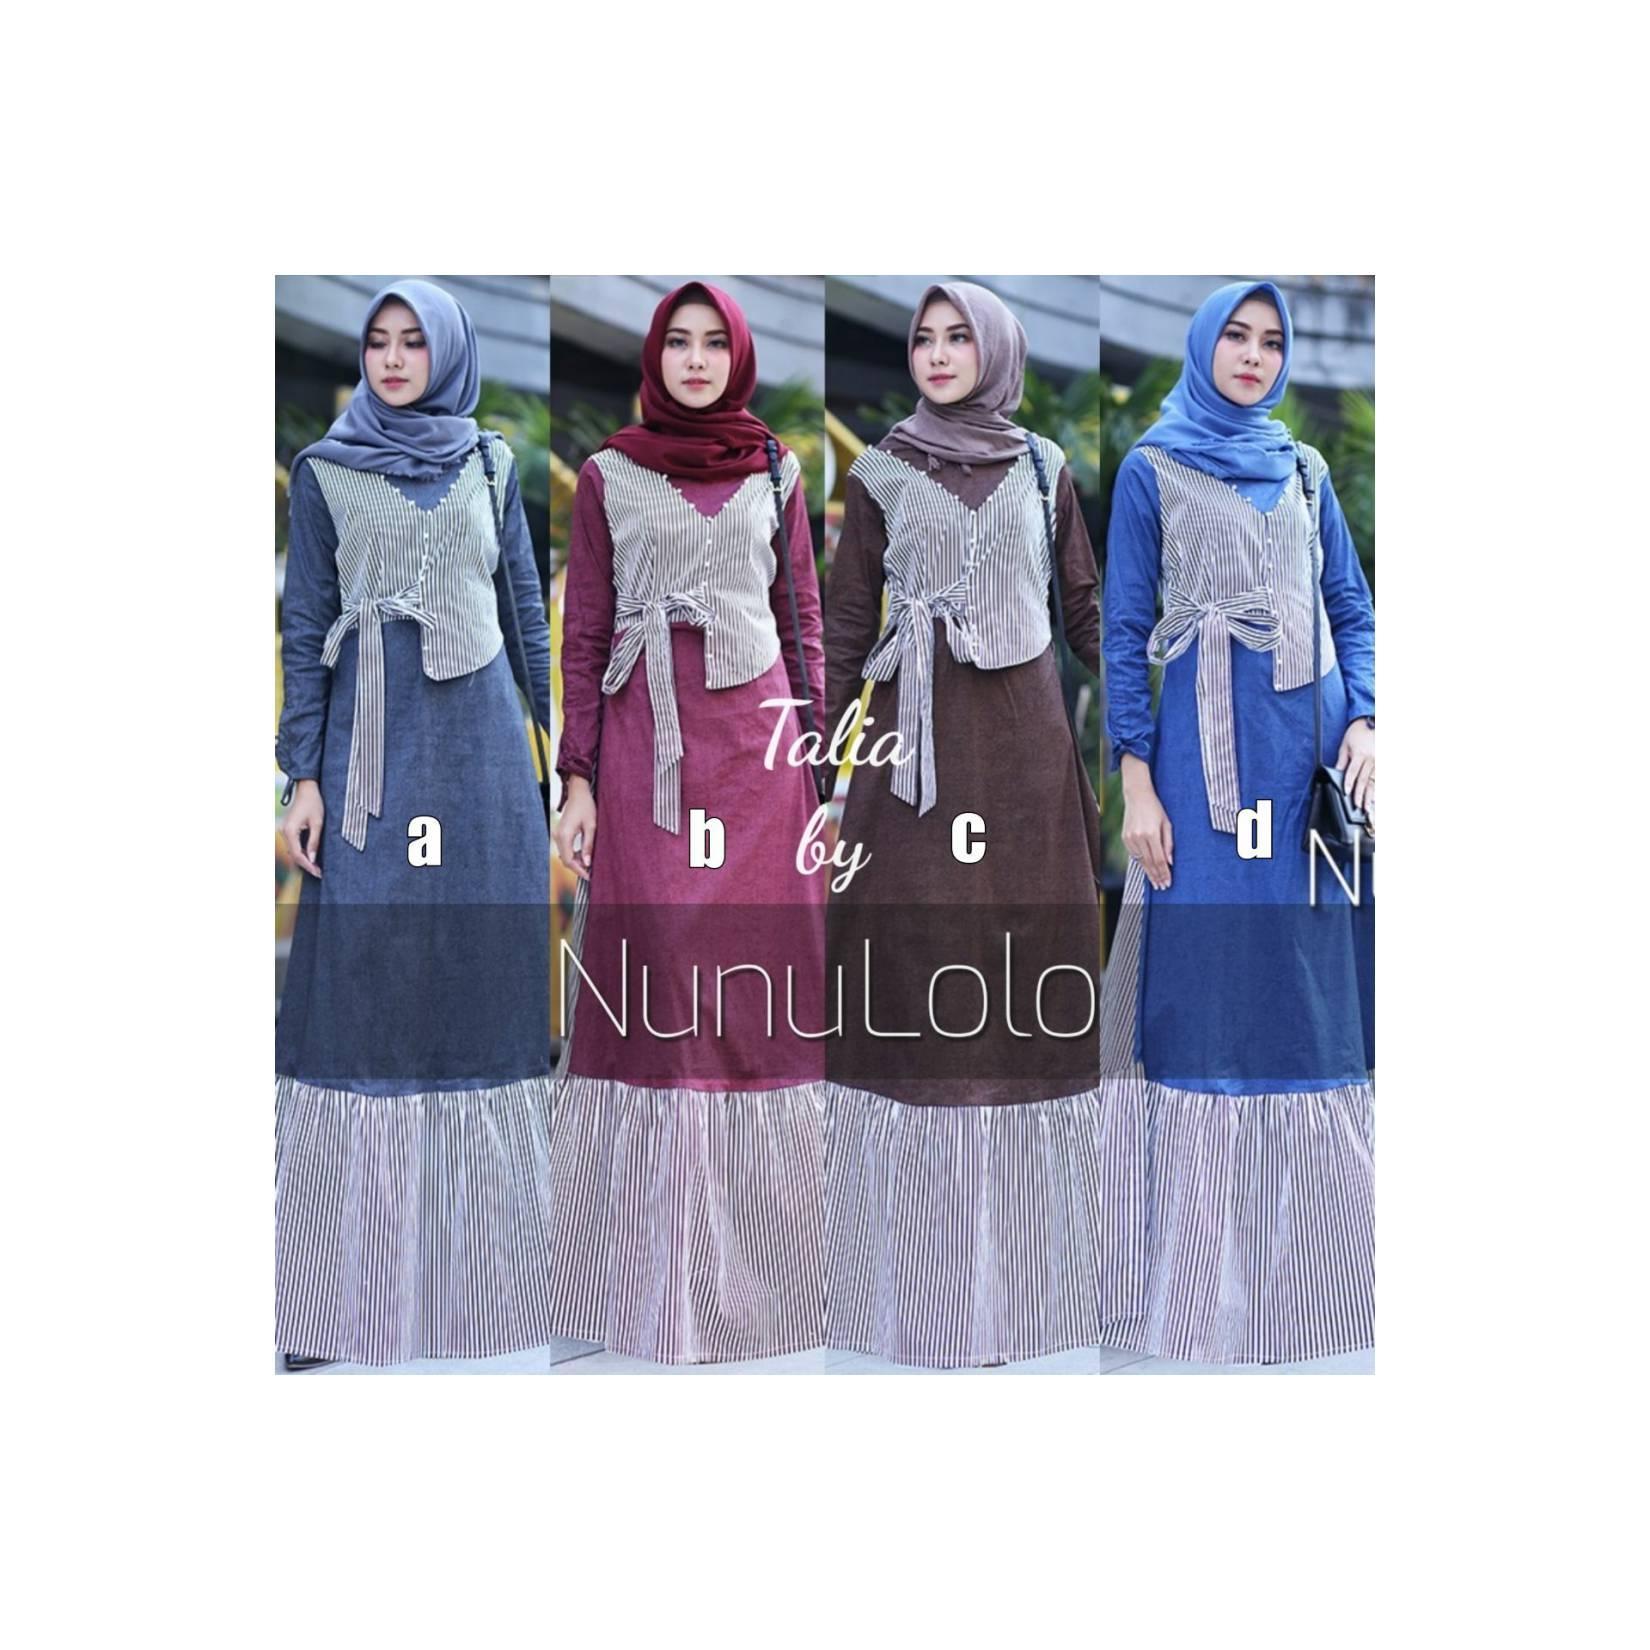 TALIA DRESS BY NUNULOLO